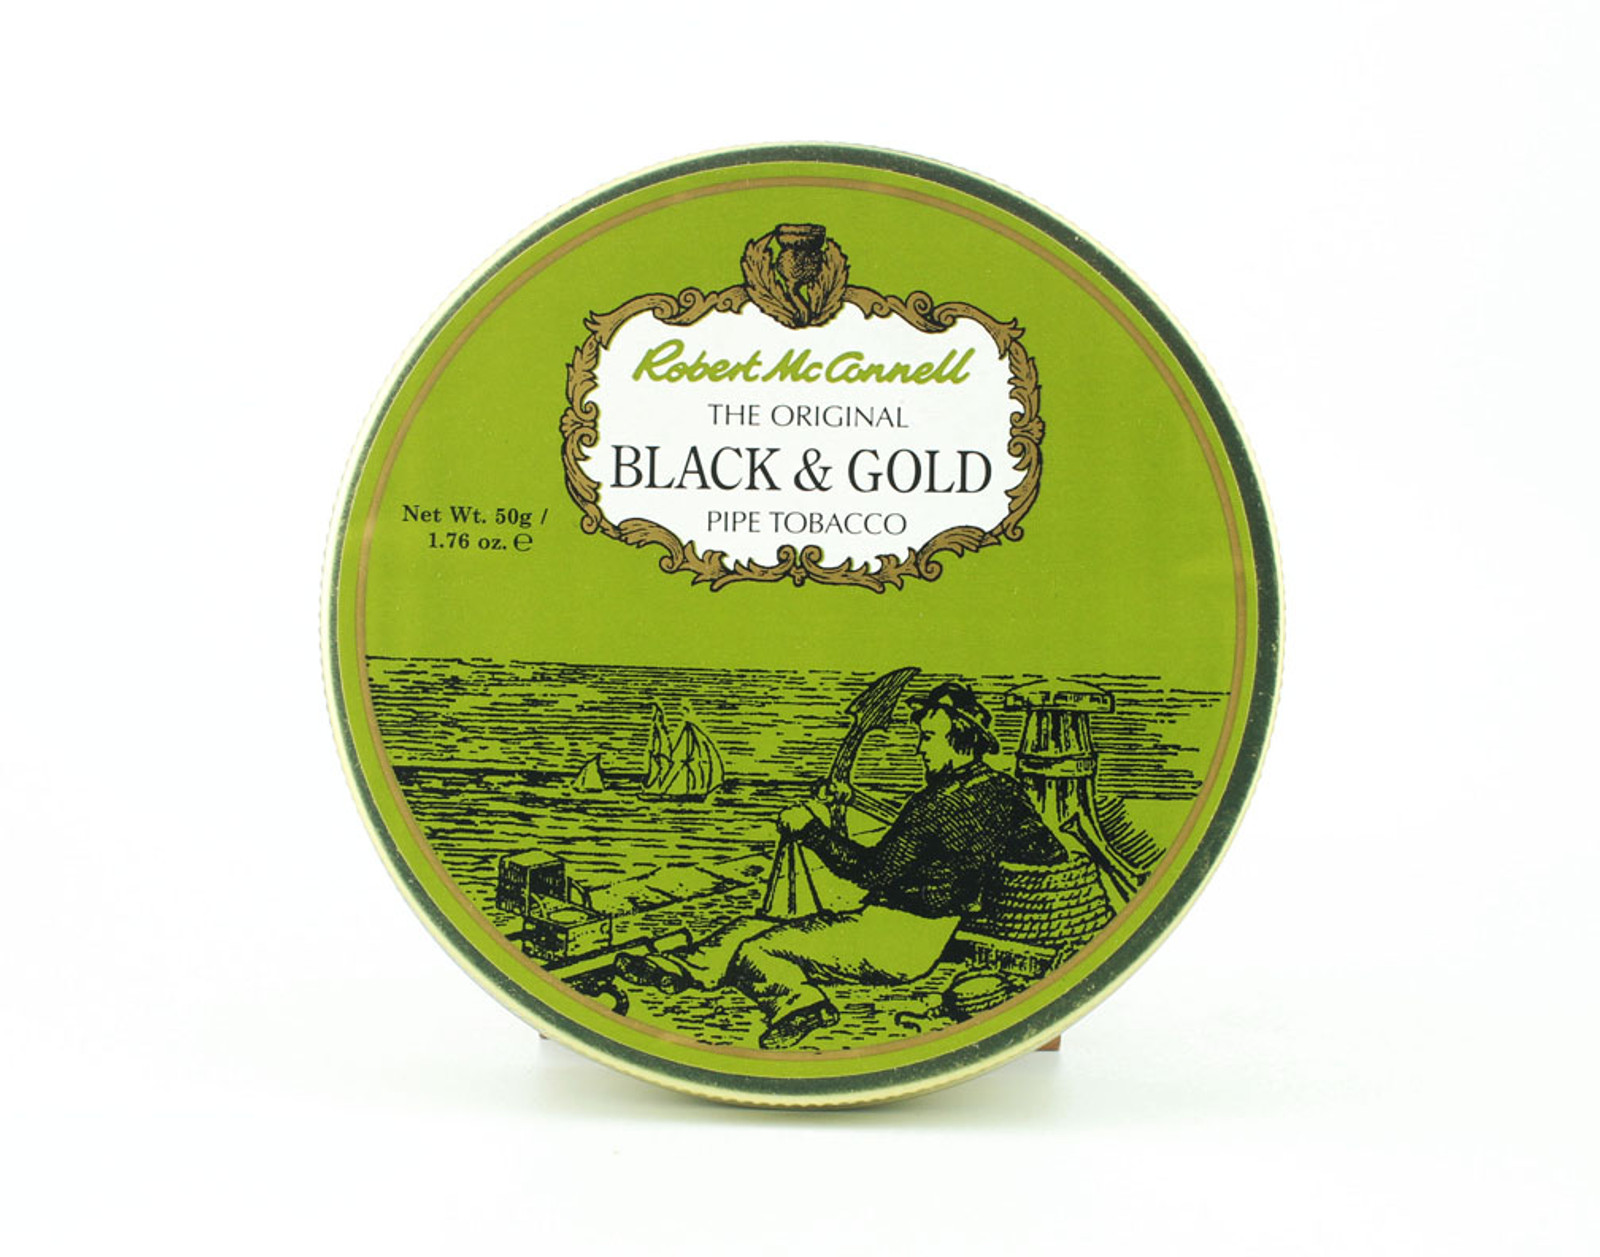 Robert McConnell Black & Gold (50g tin)